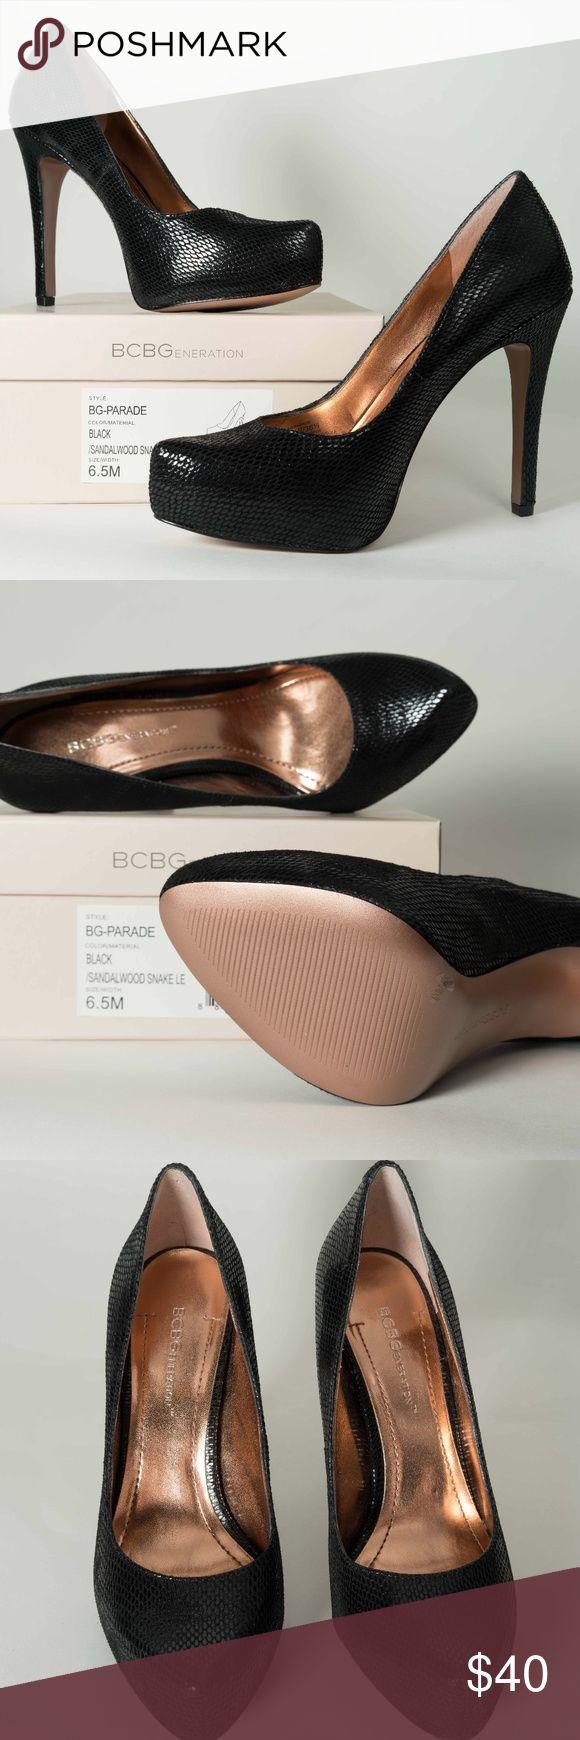 Selling this BCBGeneration stilettos NWT on Poshmark! My username is: autigers757. #shopmycloset #poshmark #fashion #shopping #style #forsale #BCBGeneration #Shoes